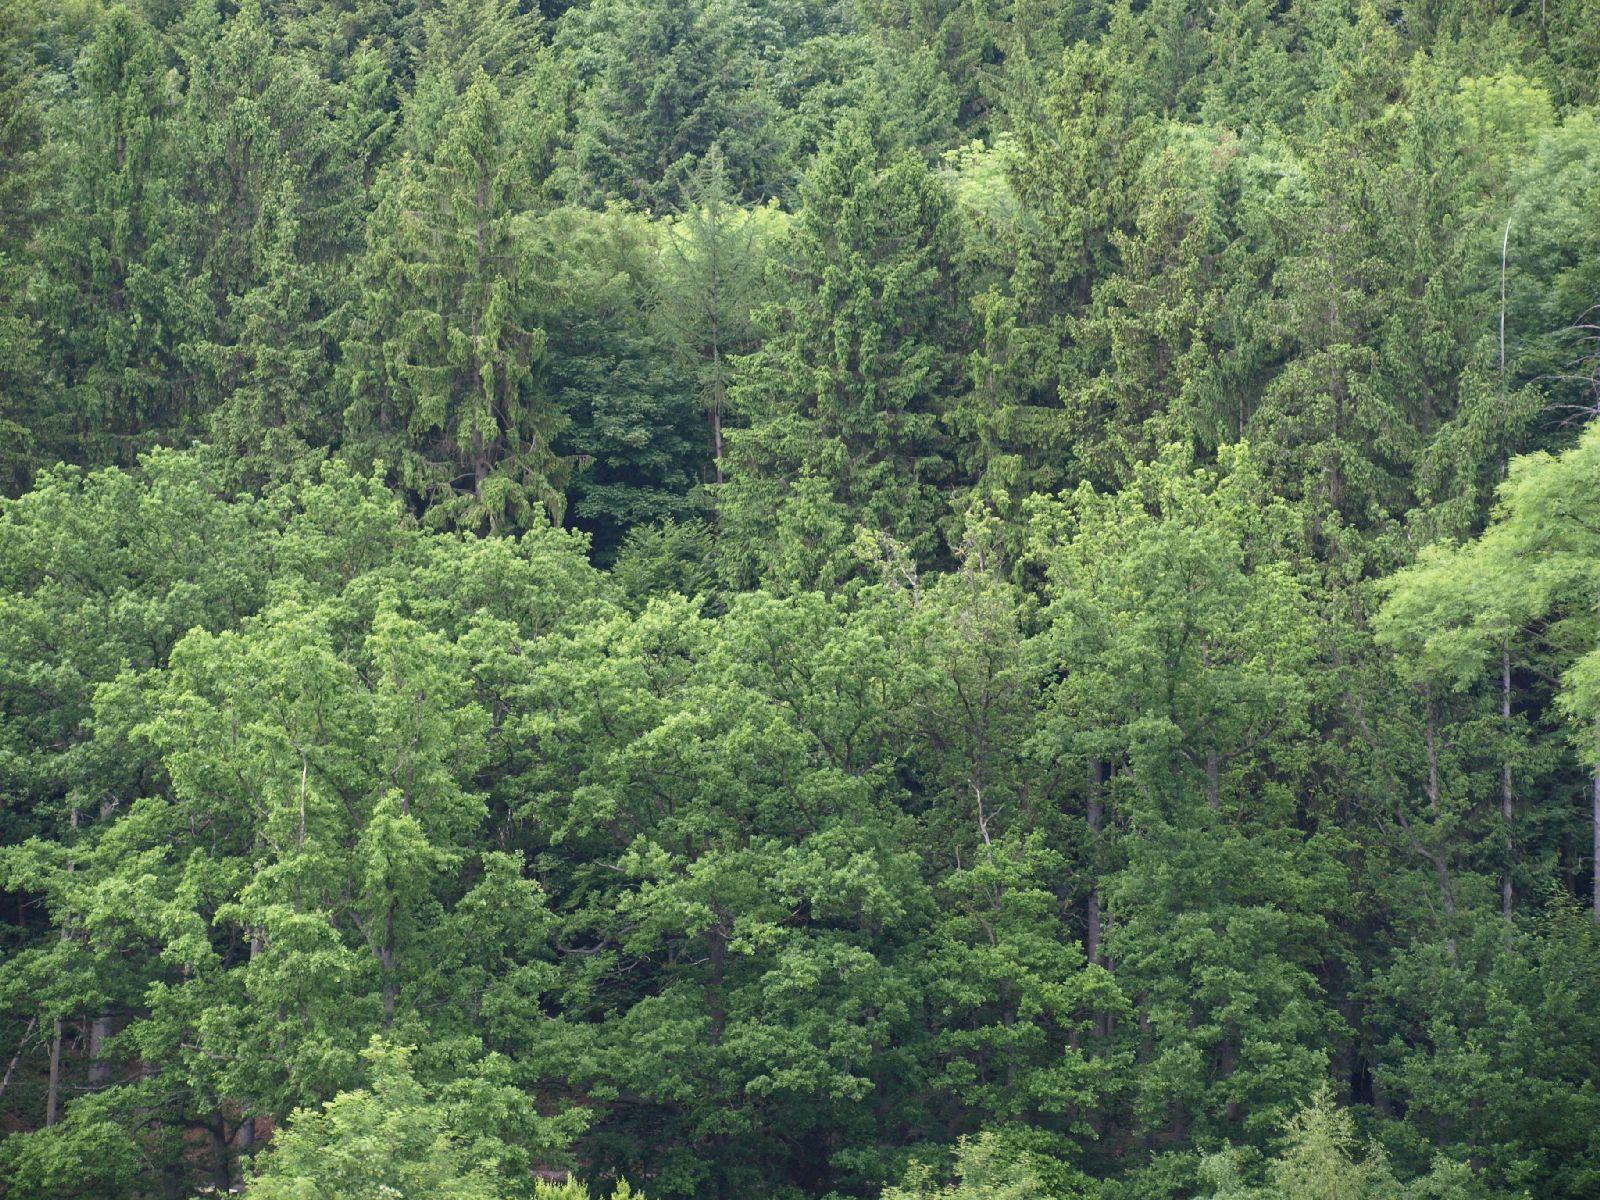 Plants-Trees_Photo_Texture_B_P6036443